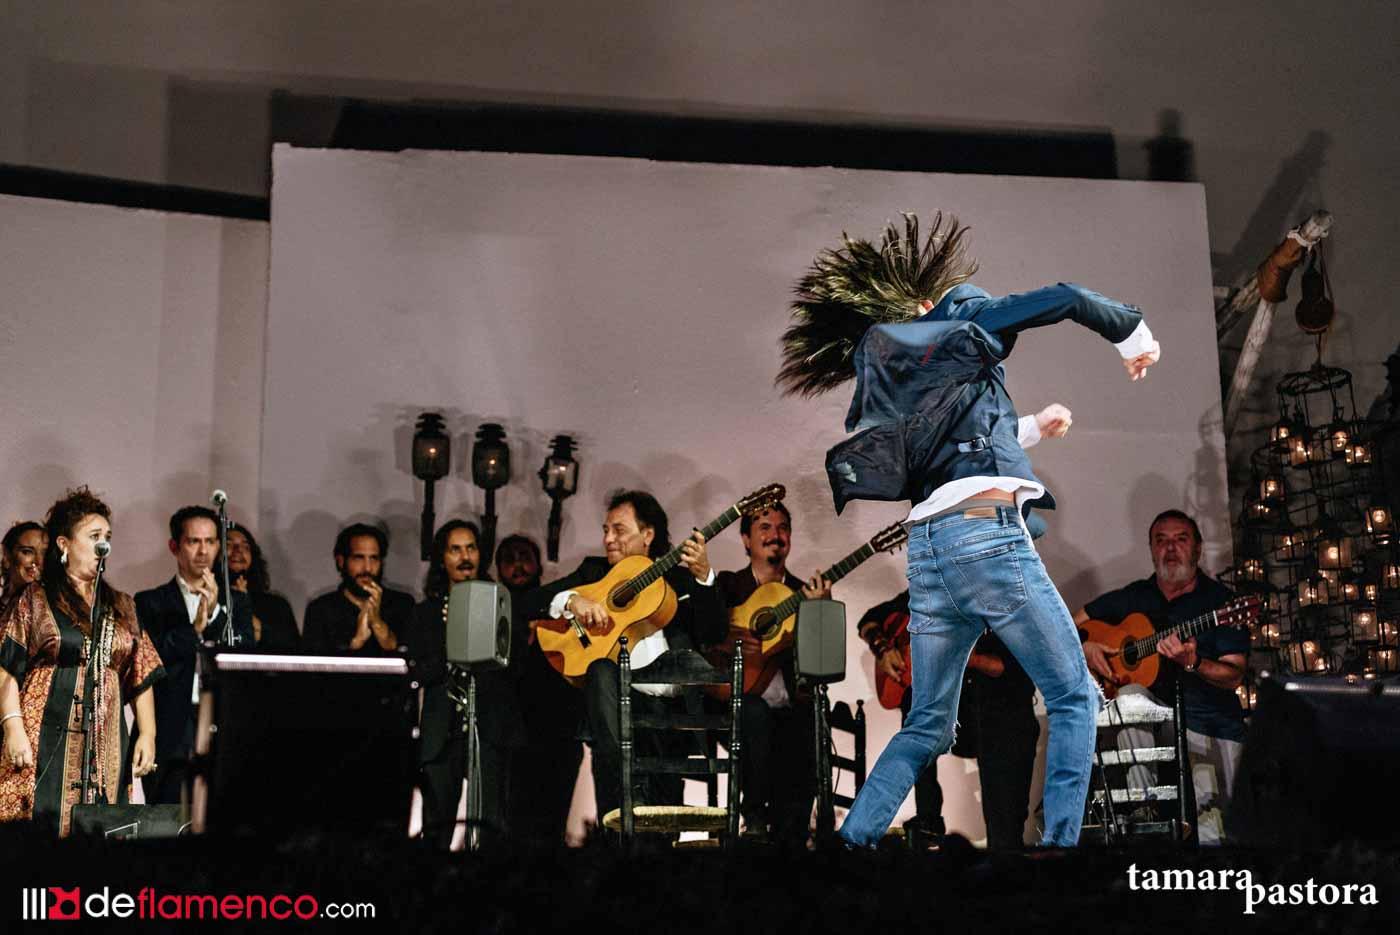 Reunión de Cante Jondo - Puebla de Cazalla 2021